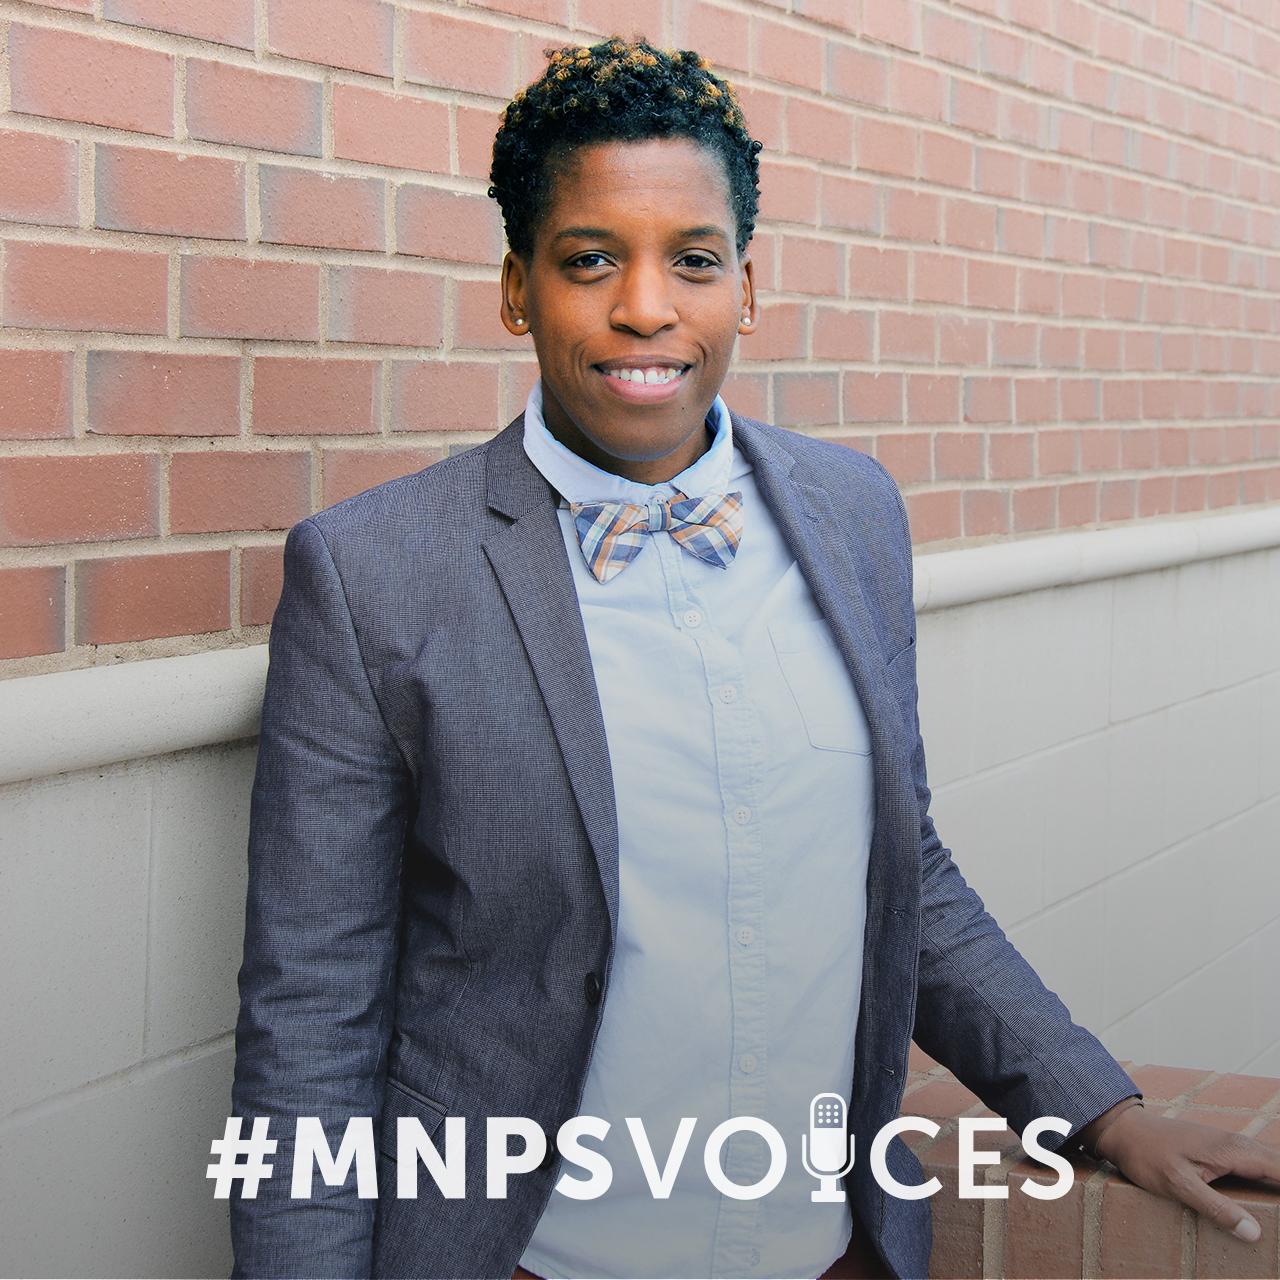 #MNPSVoices: Melissa Gordon, Restorative Practices Specialist